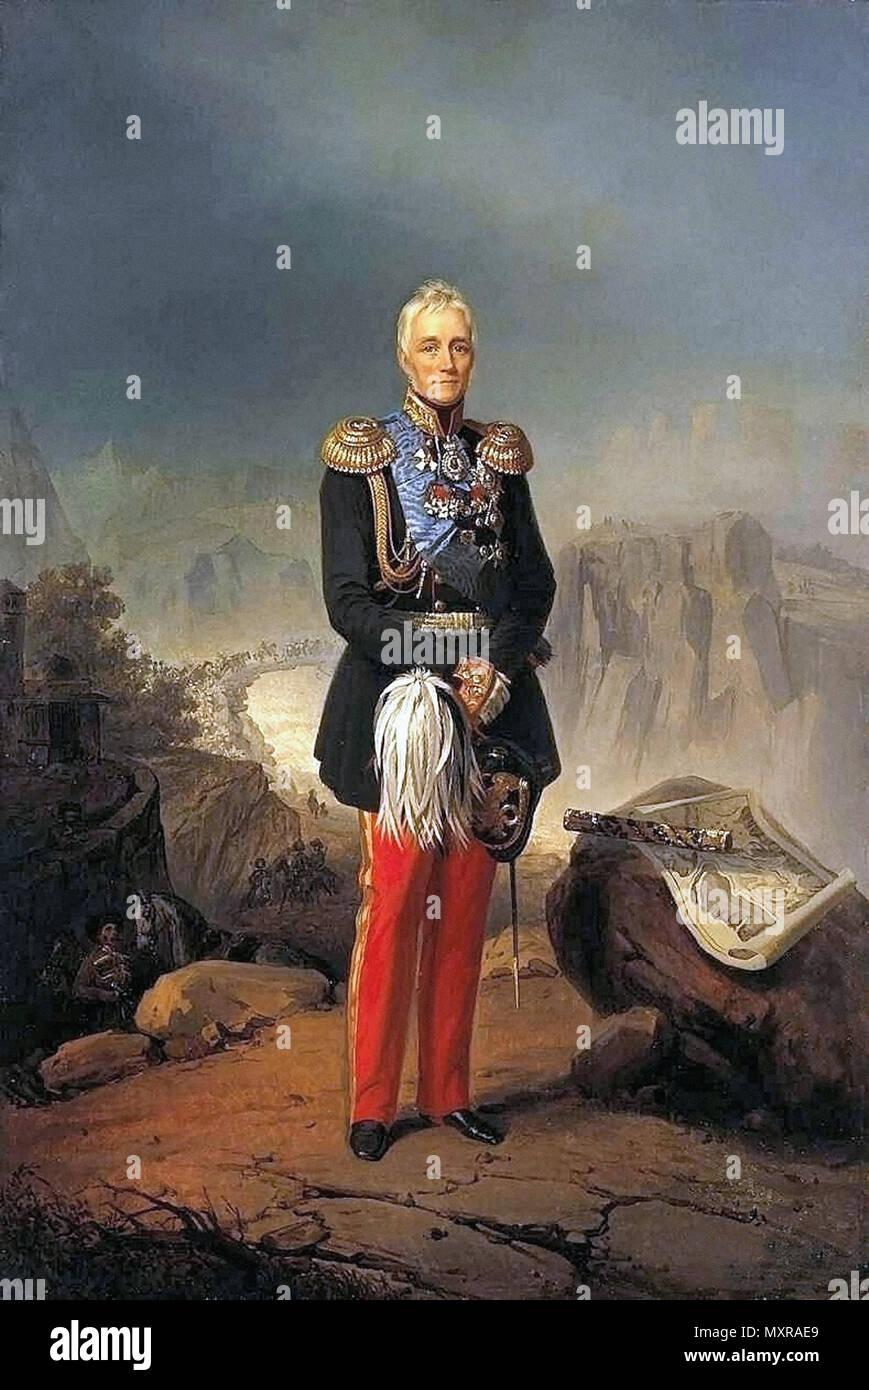 Villevalde Bogdan Pavlovich - Portrait of Feldmarschall M.S. Vorontsov - Stock Image